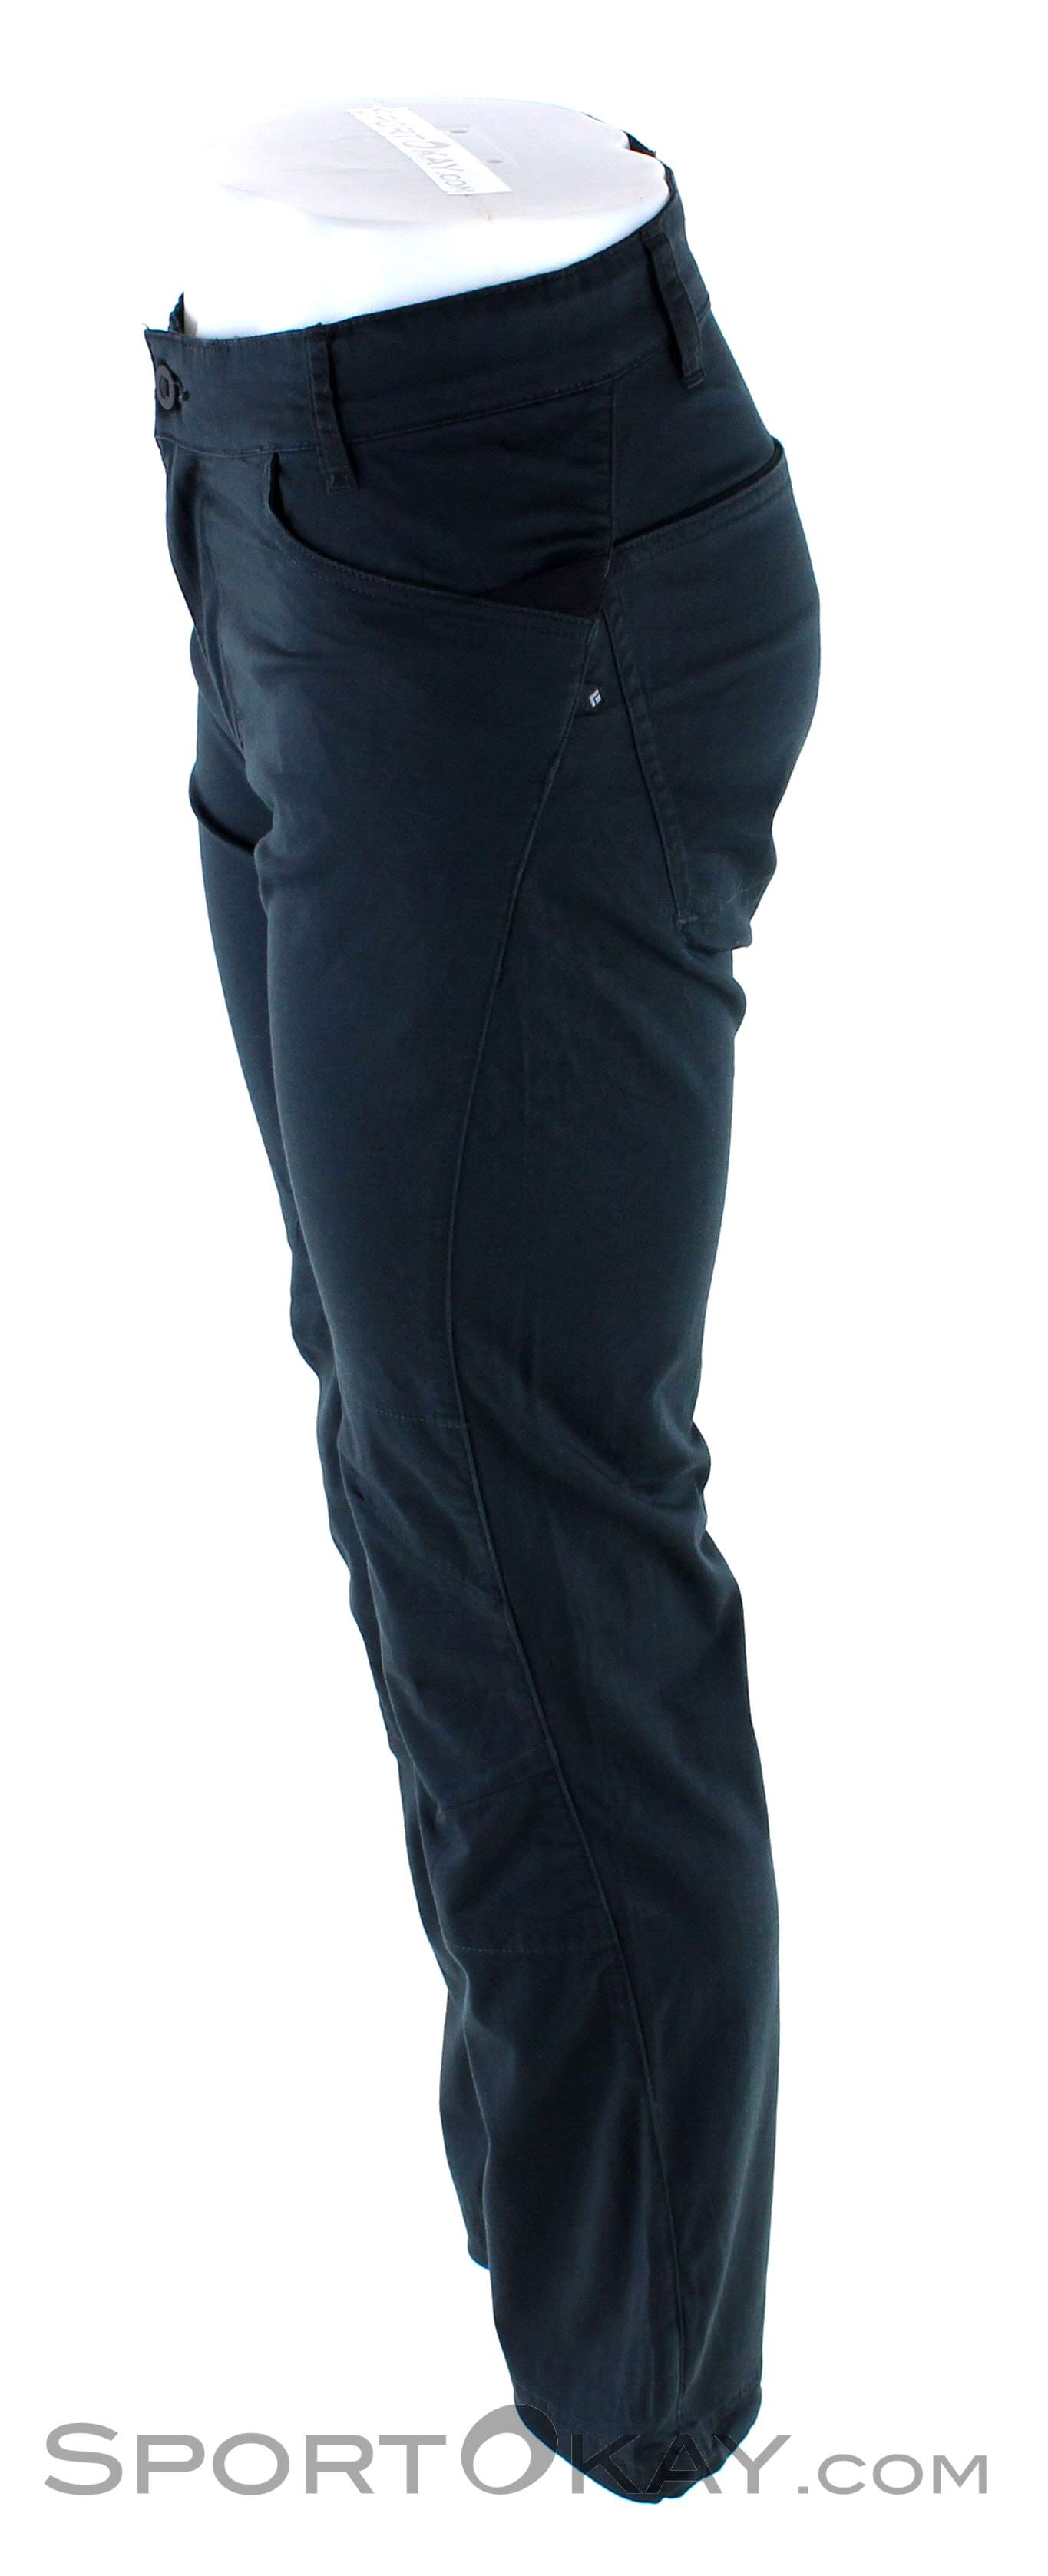 Black Diamond Credo Mens Climbing Pants Pants Outdoor